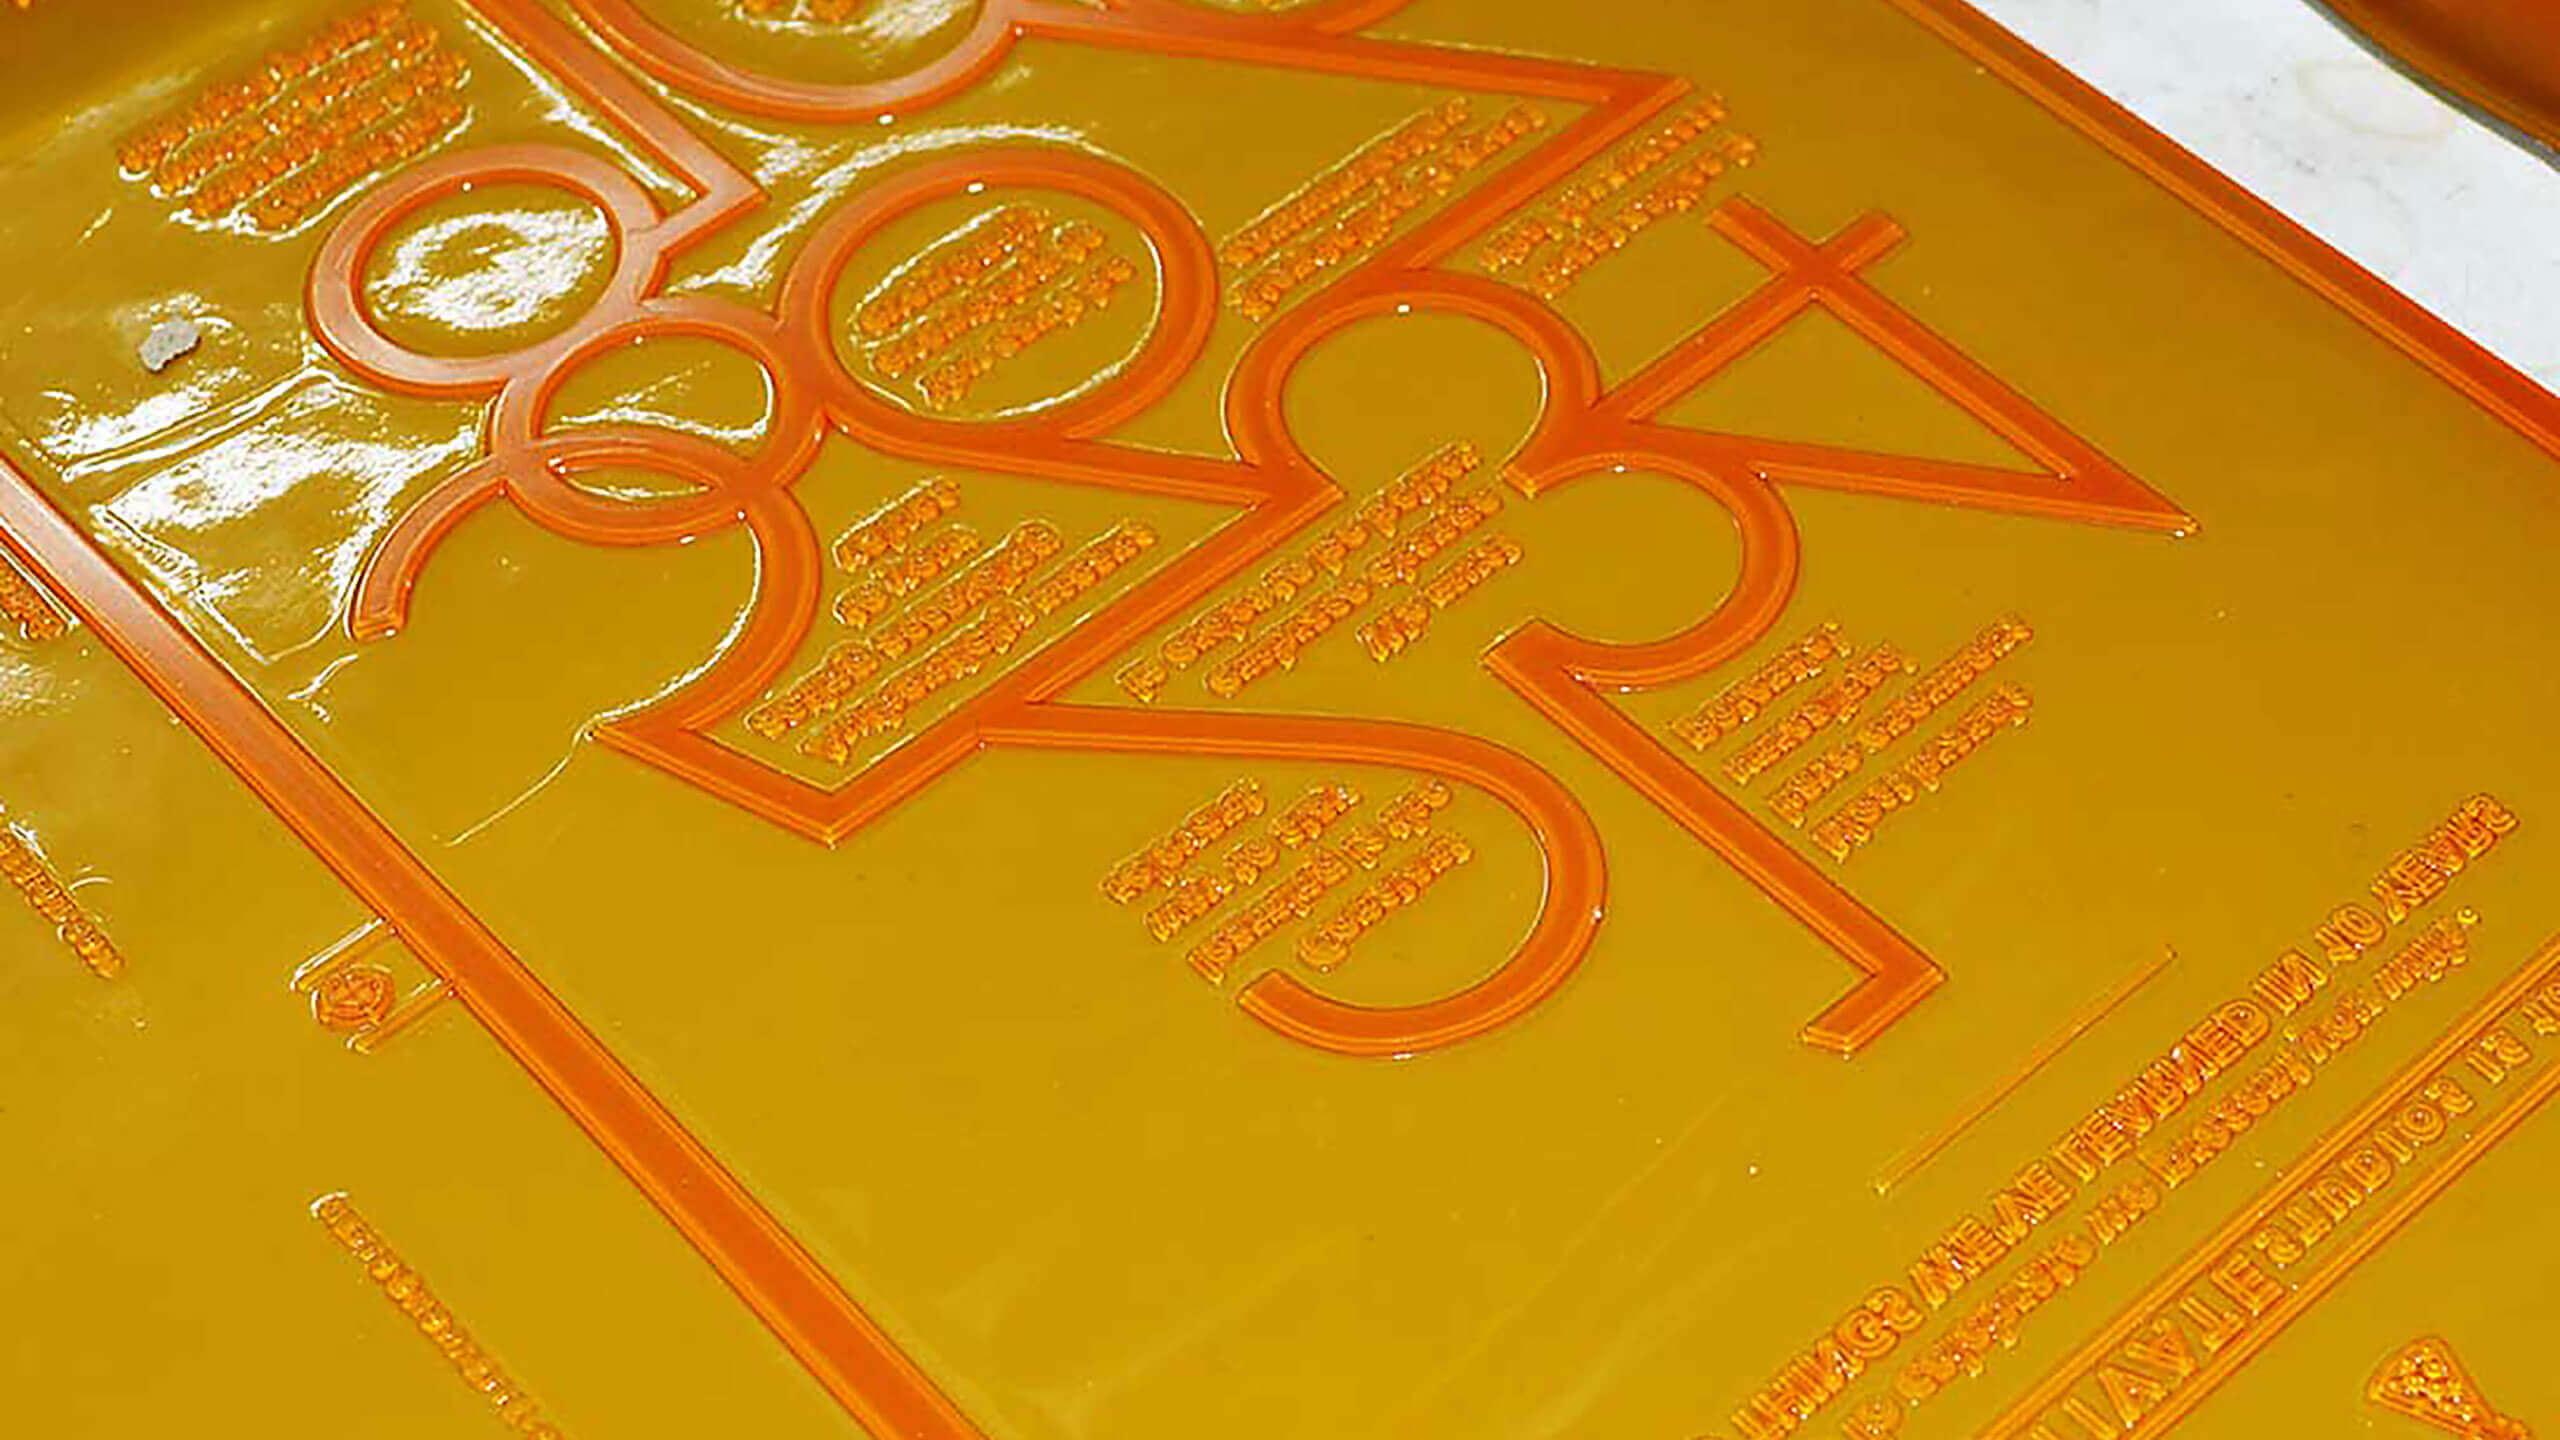 Water-Washable, Varnish & Metal-Based Plates